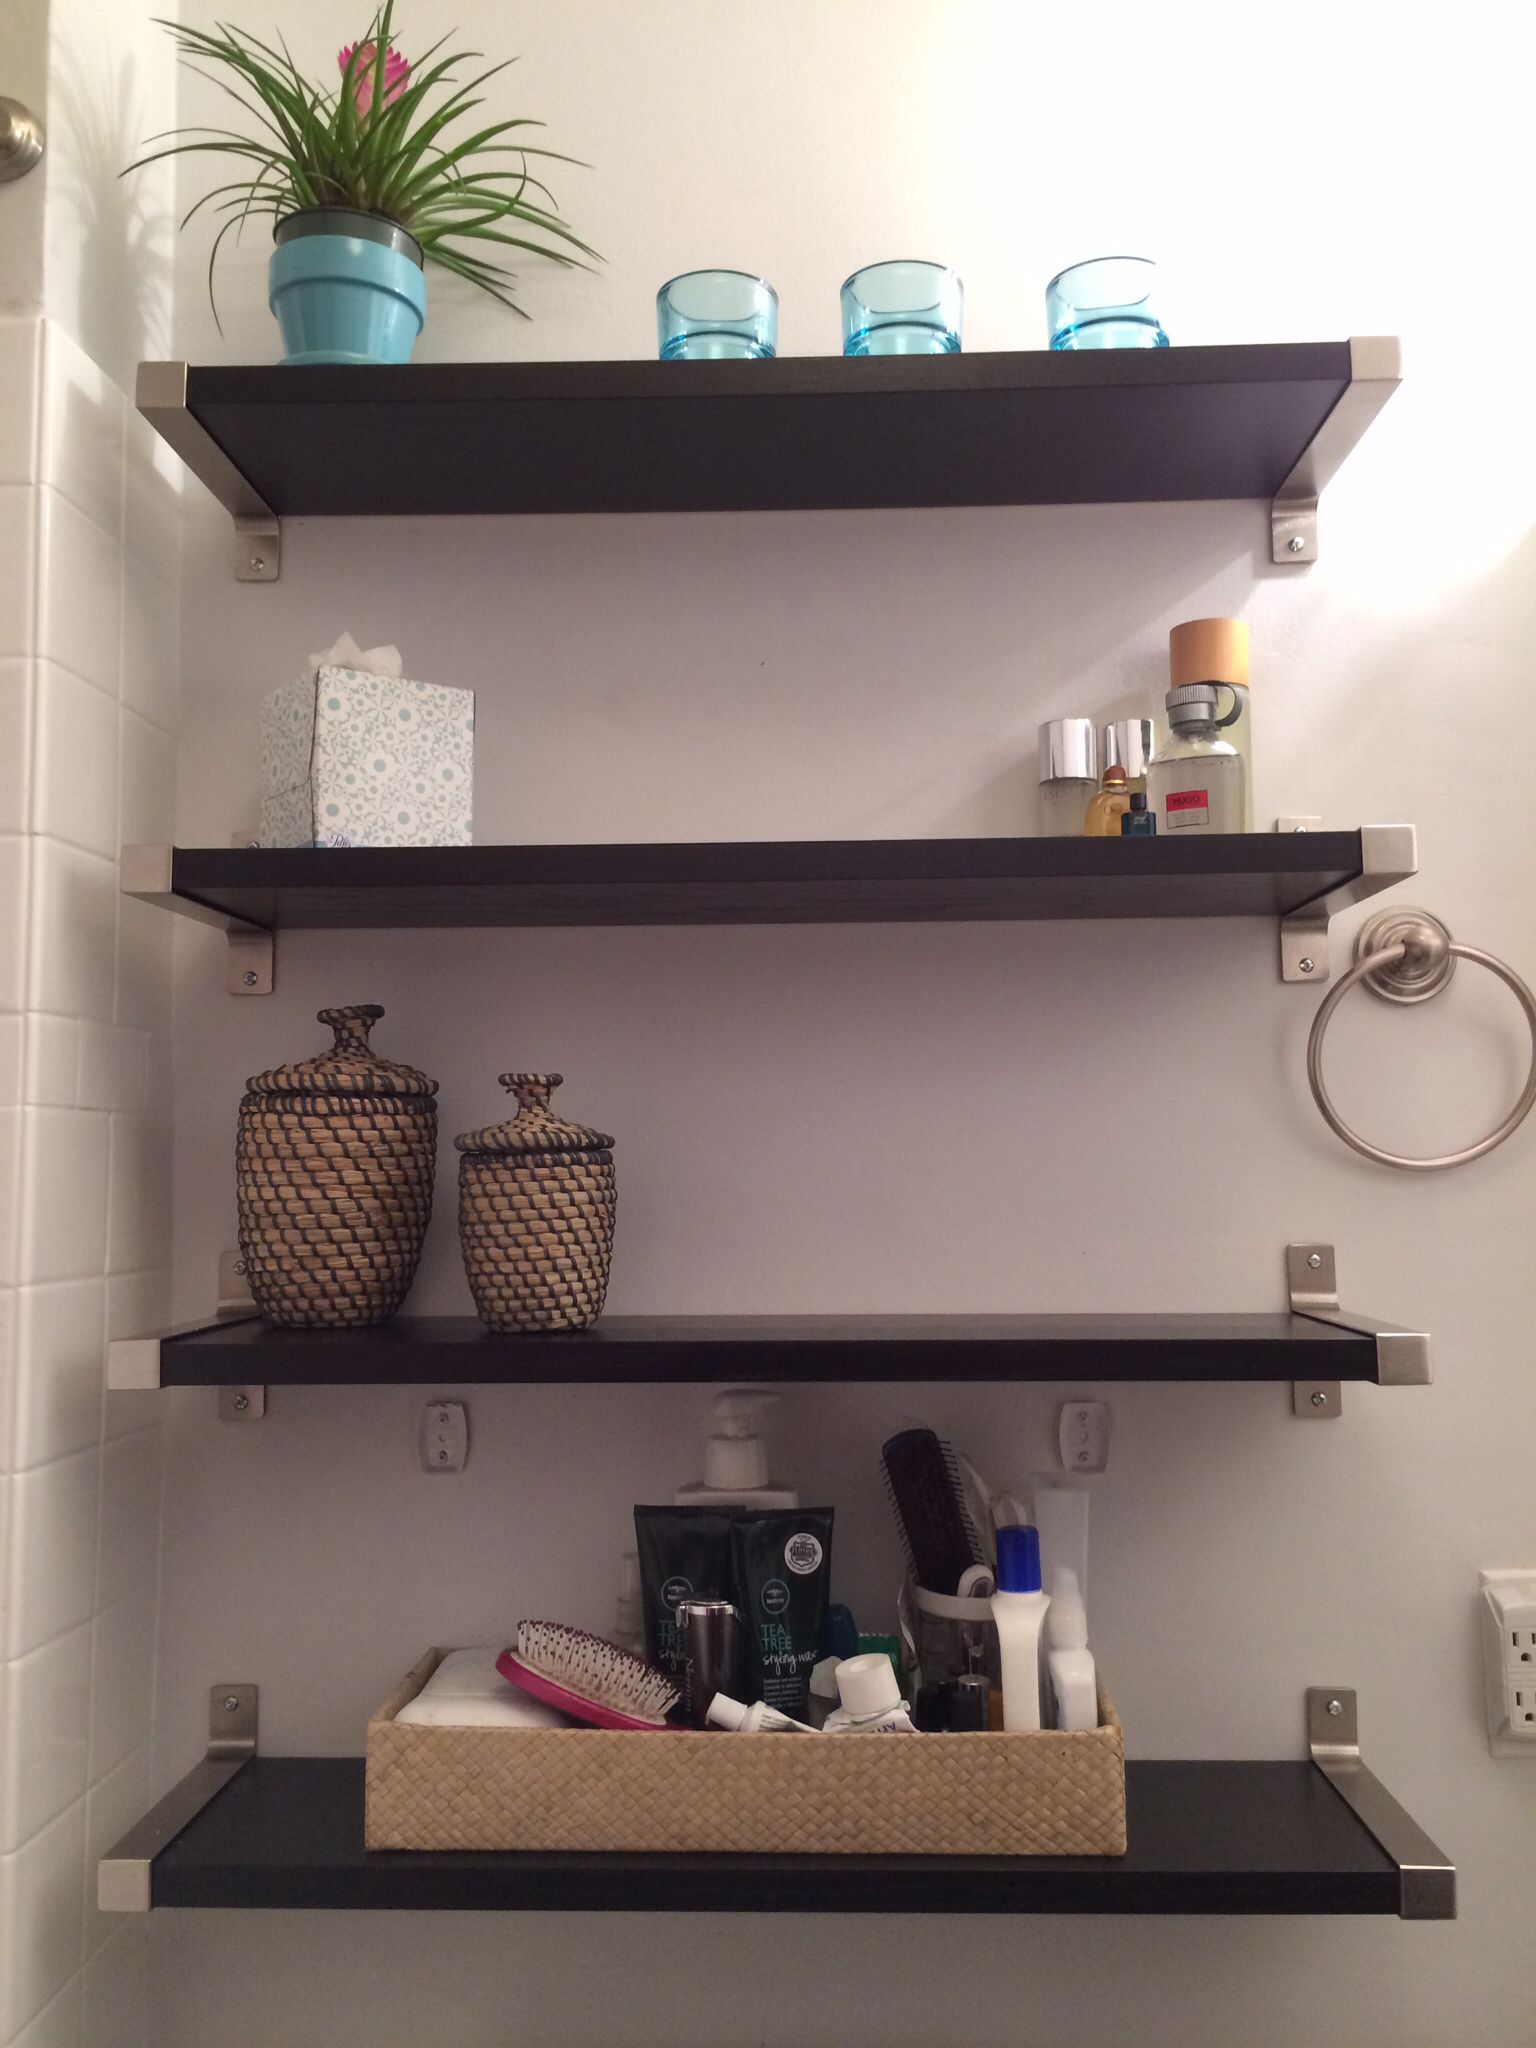 Small Bathroom Wall Shelves